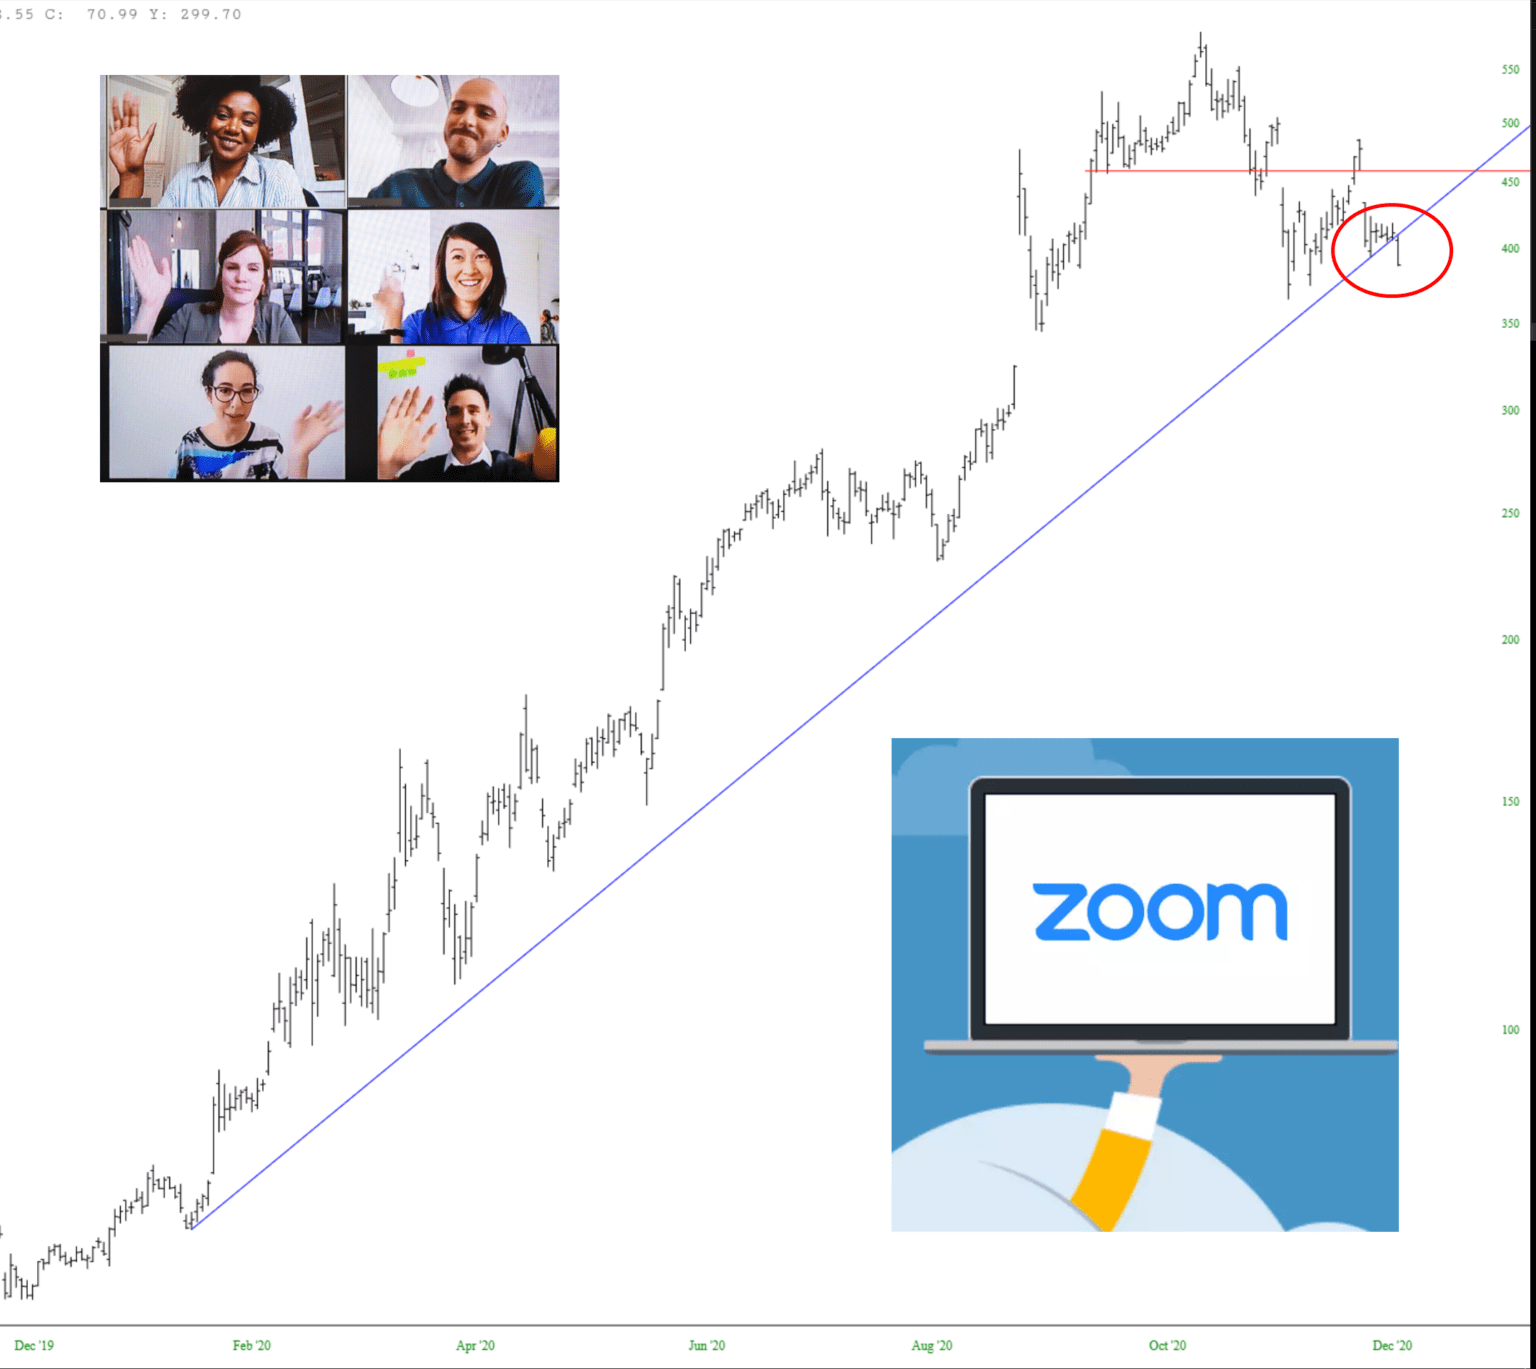 Zoom 1-Year Chart.